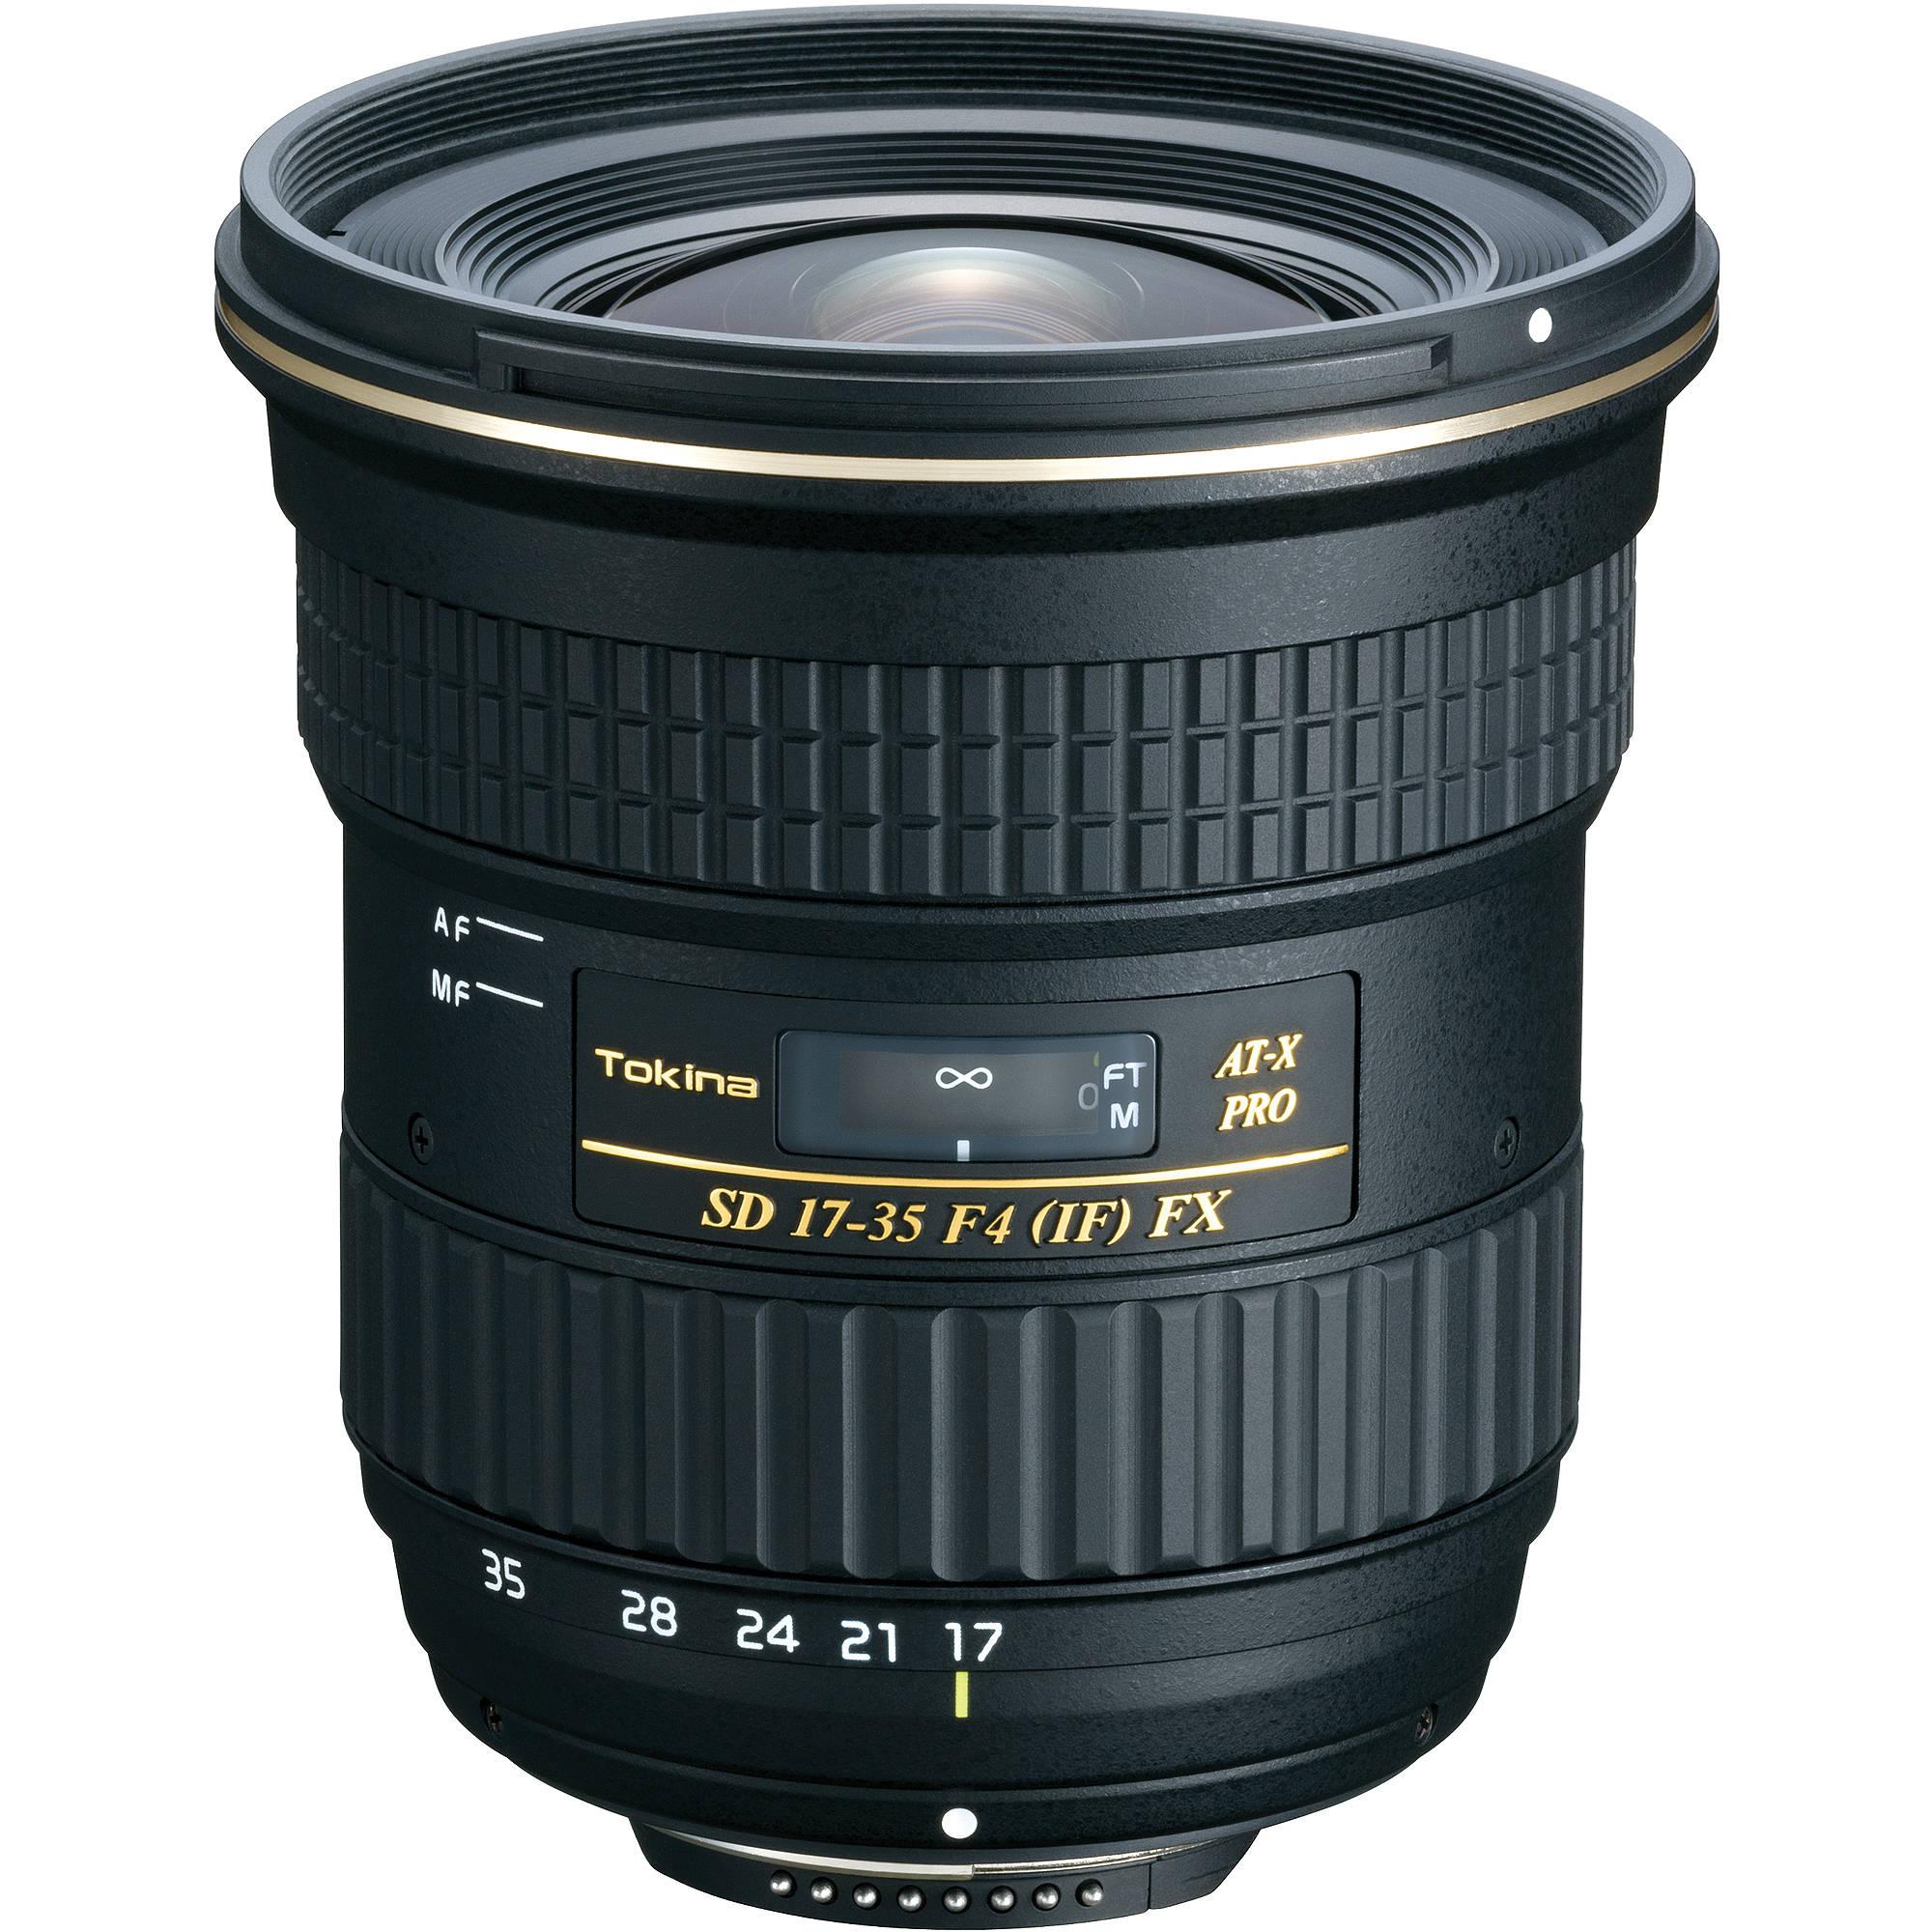 Tokina SD 17-35mm F4 ATX PRO FX Canon o Nikon